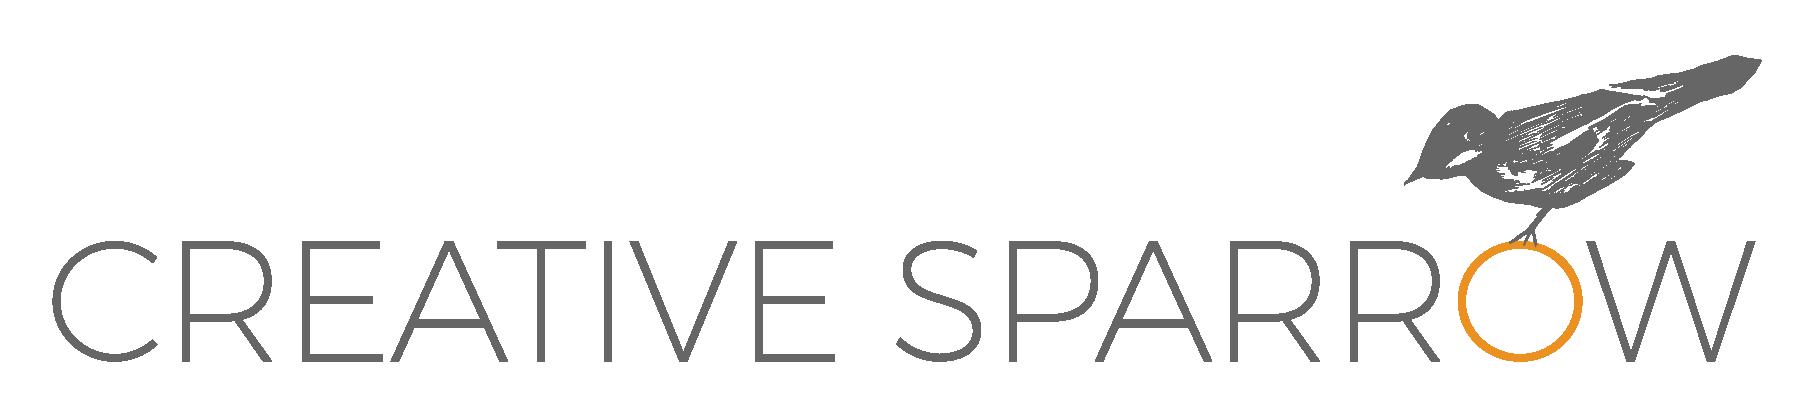 5B. Creative Sparrow Logo RGB